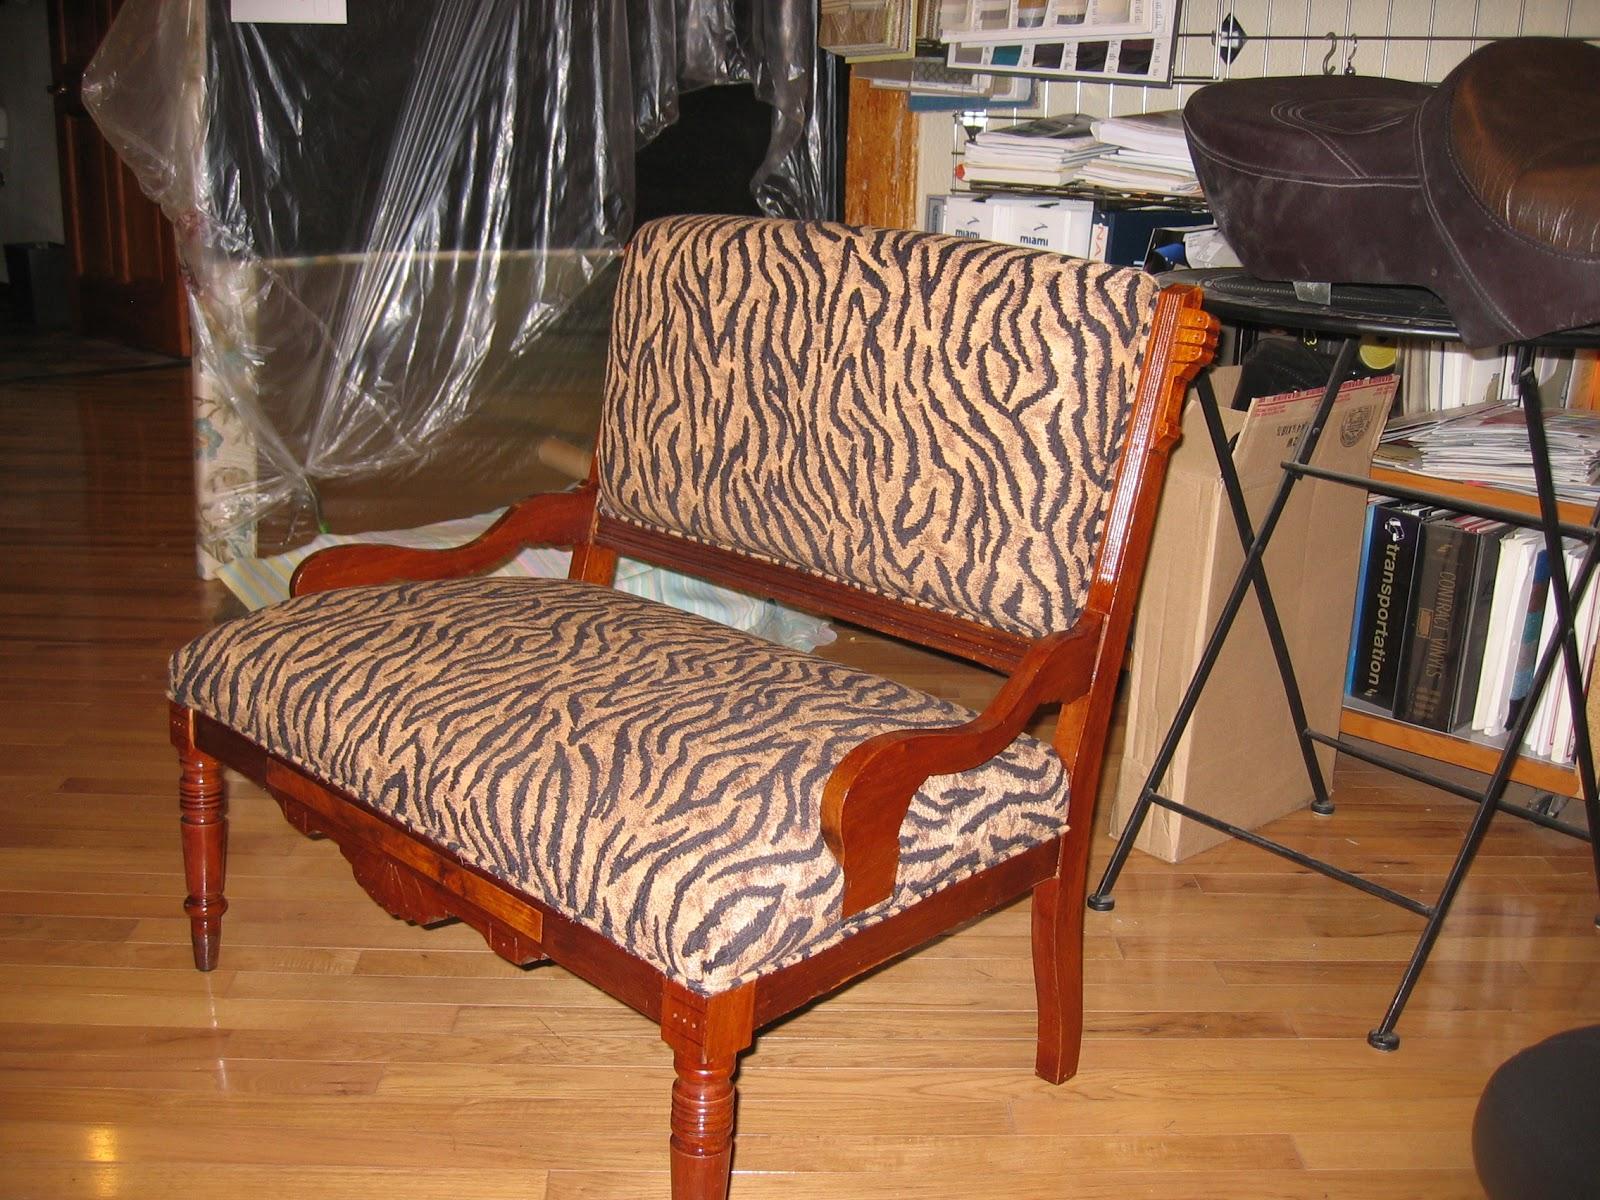 giraffe print chair sashes donati office homestyle custom upholstery and awning animal